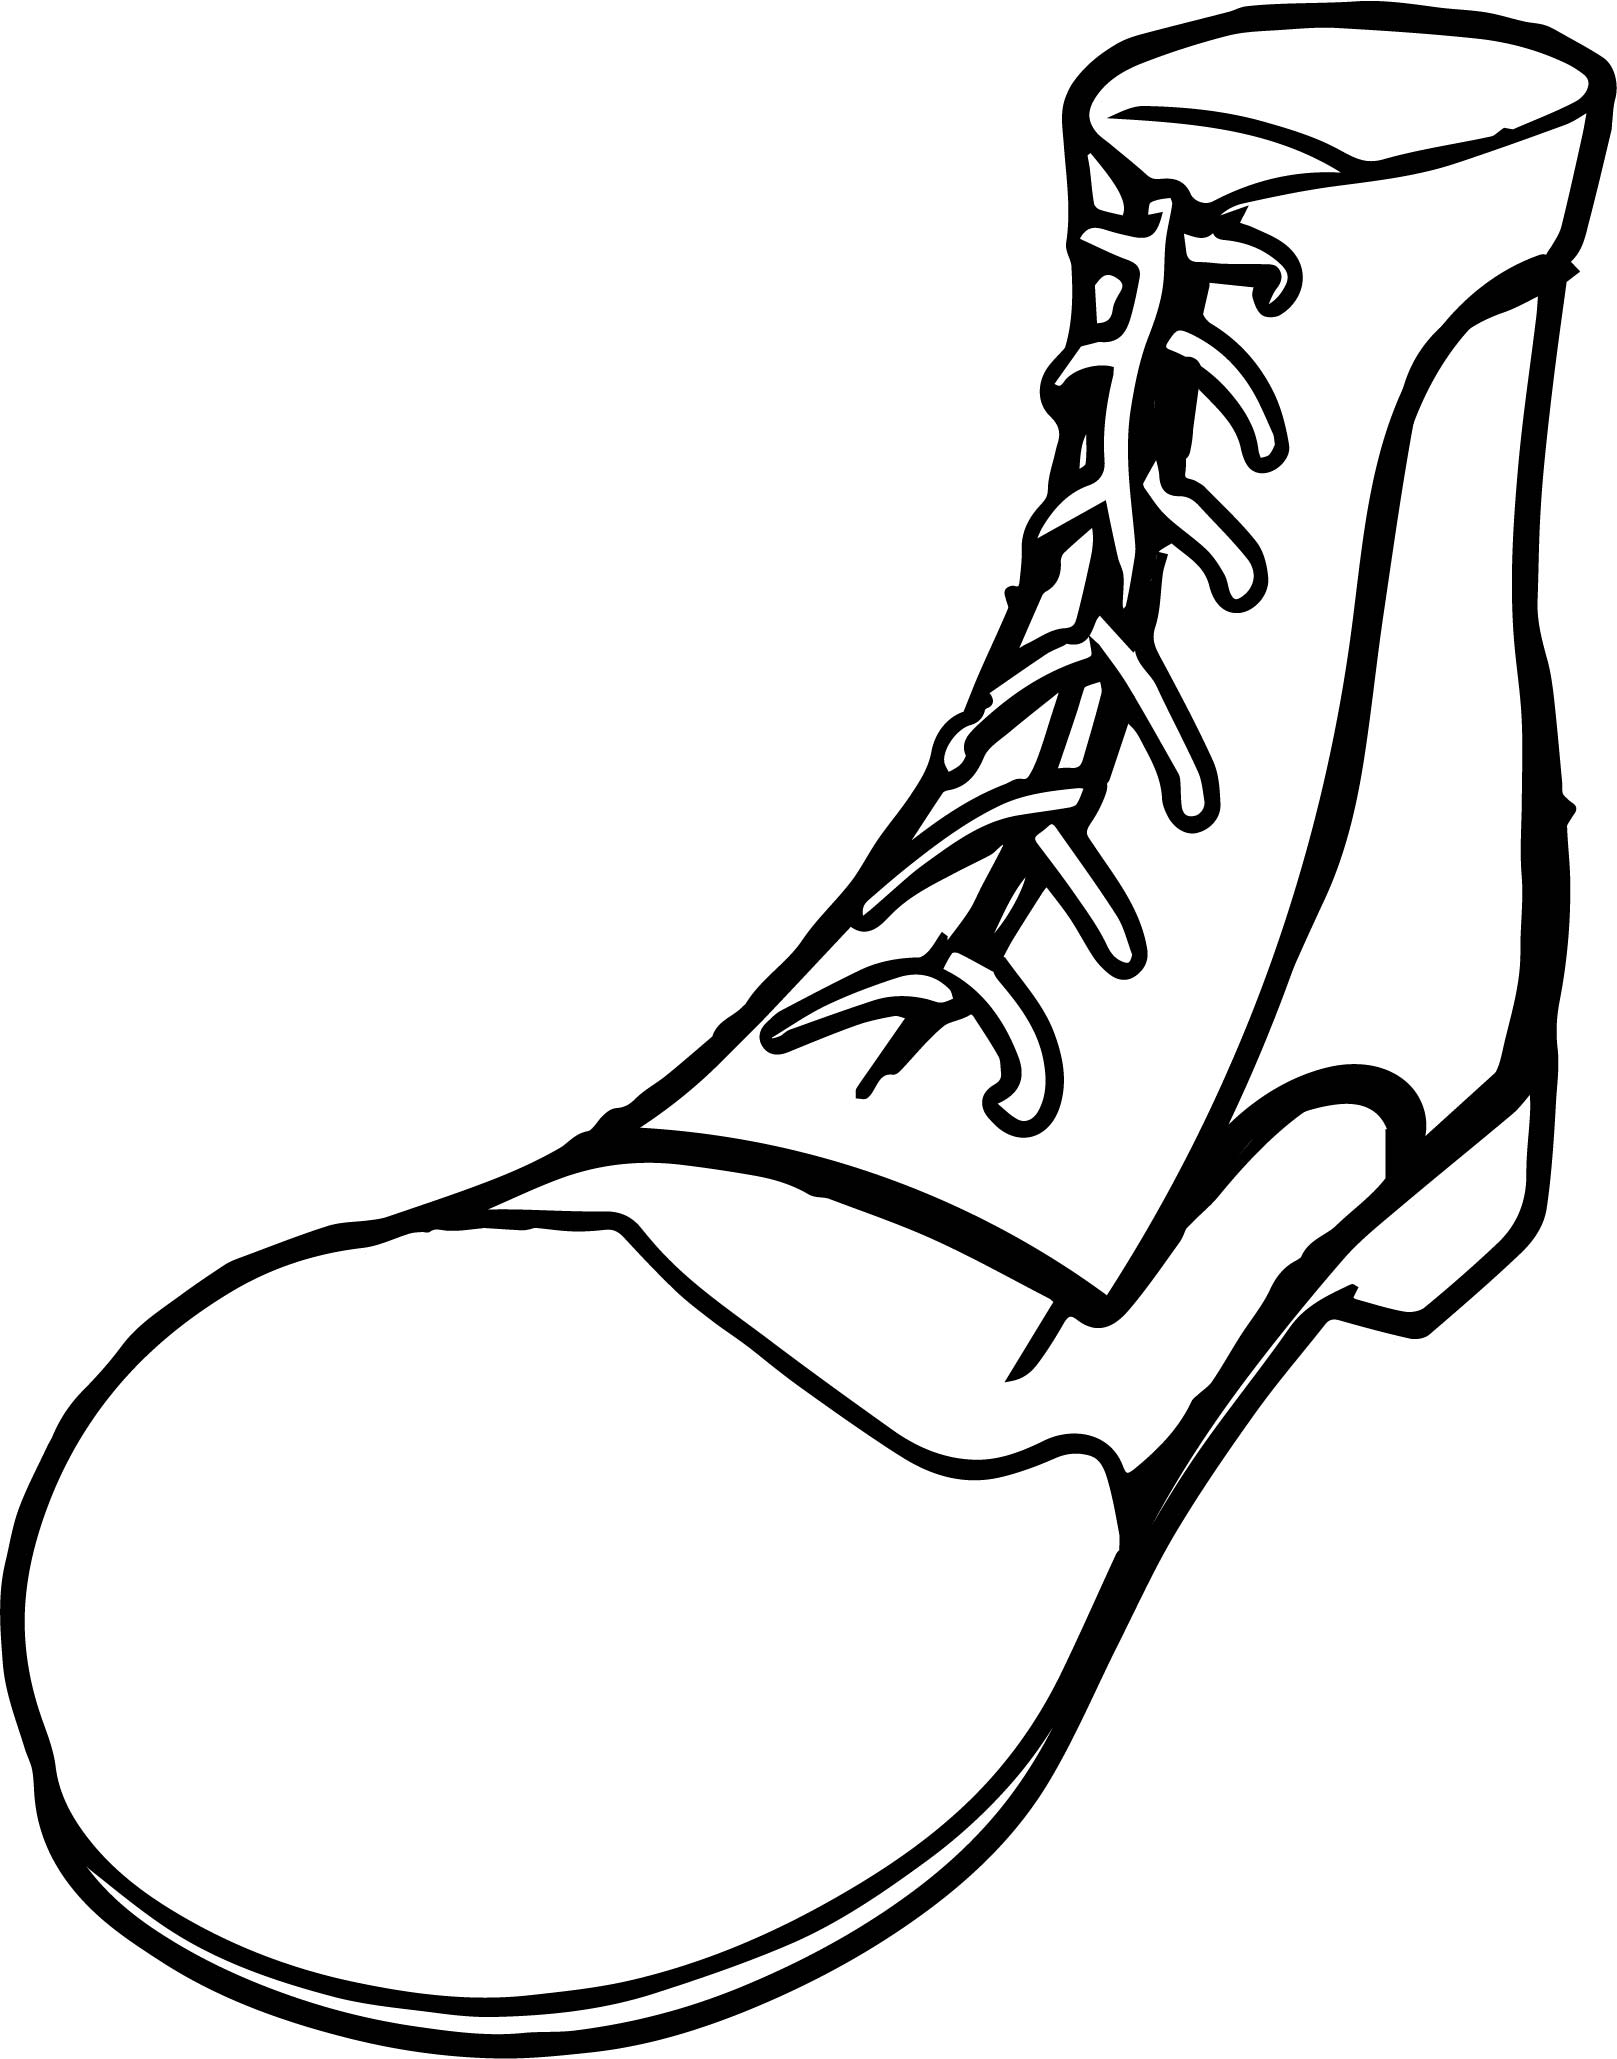 Cartoon Shoe Drawing at GetDrawings